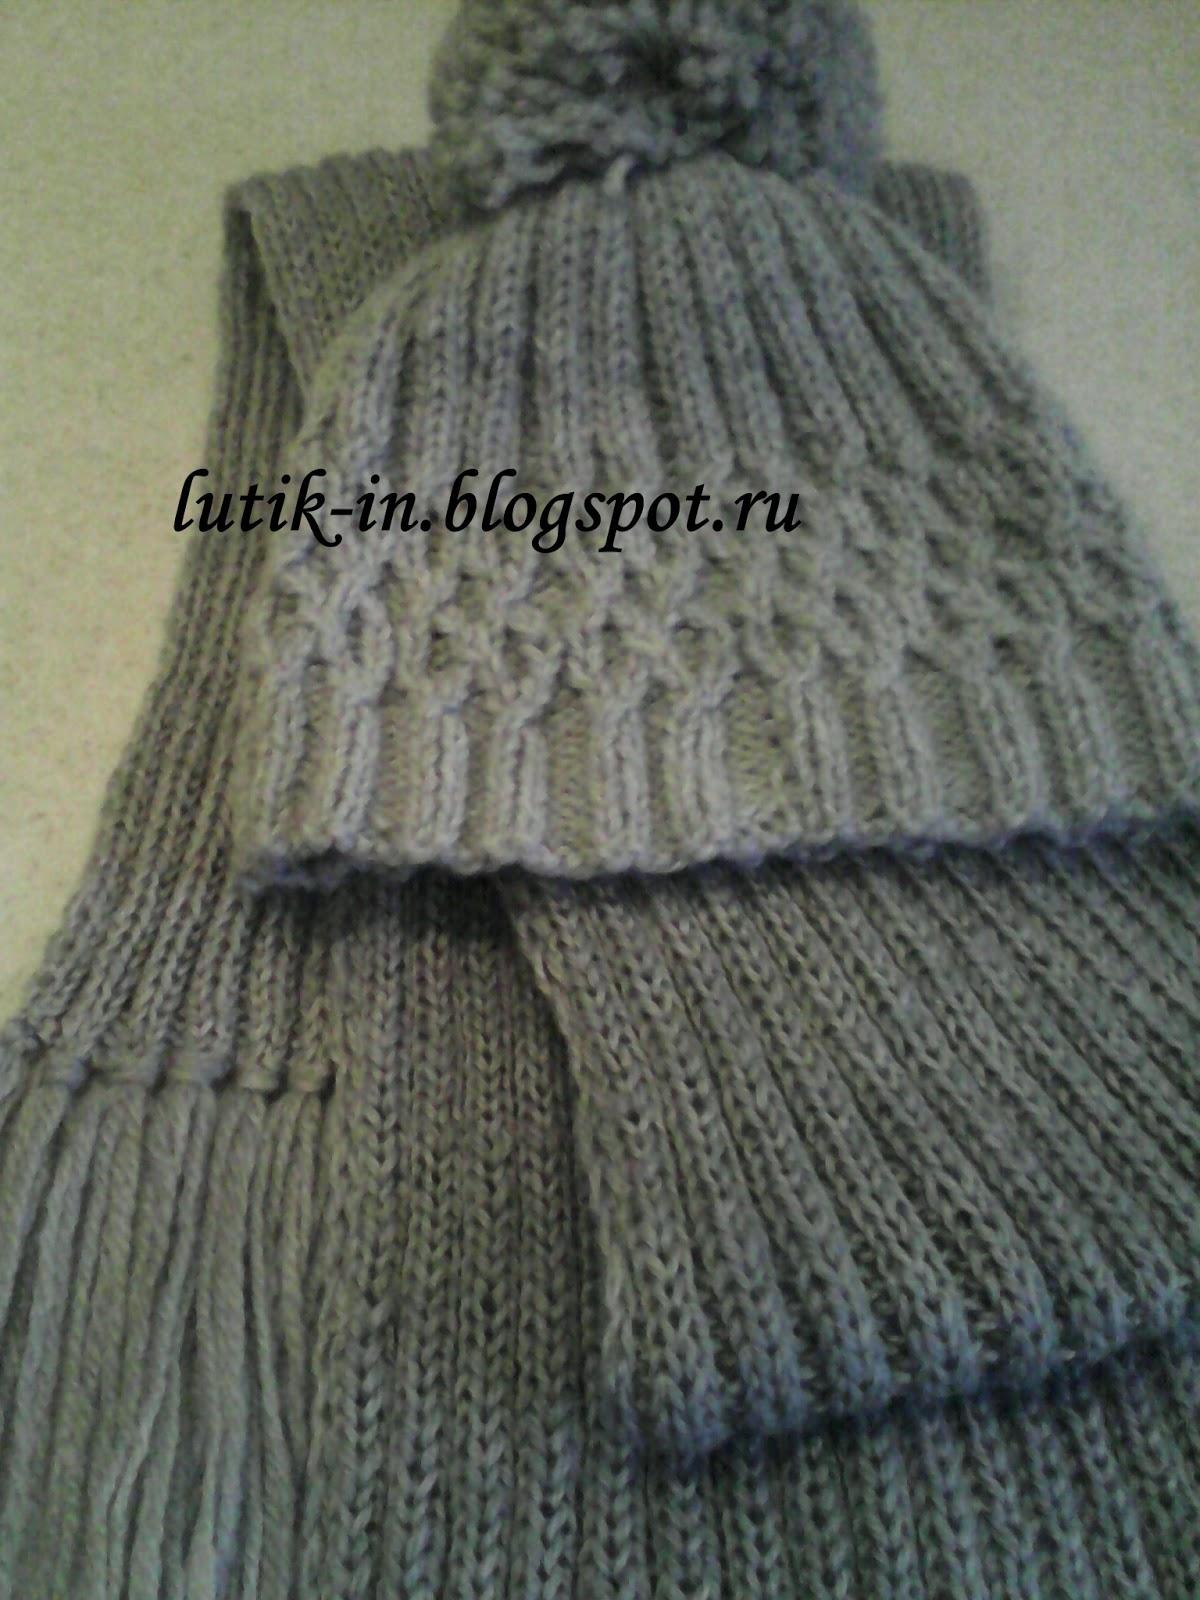 lutik-вязание крючком и спицами: вязаная шапочка с ...